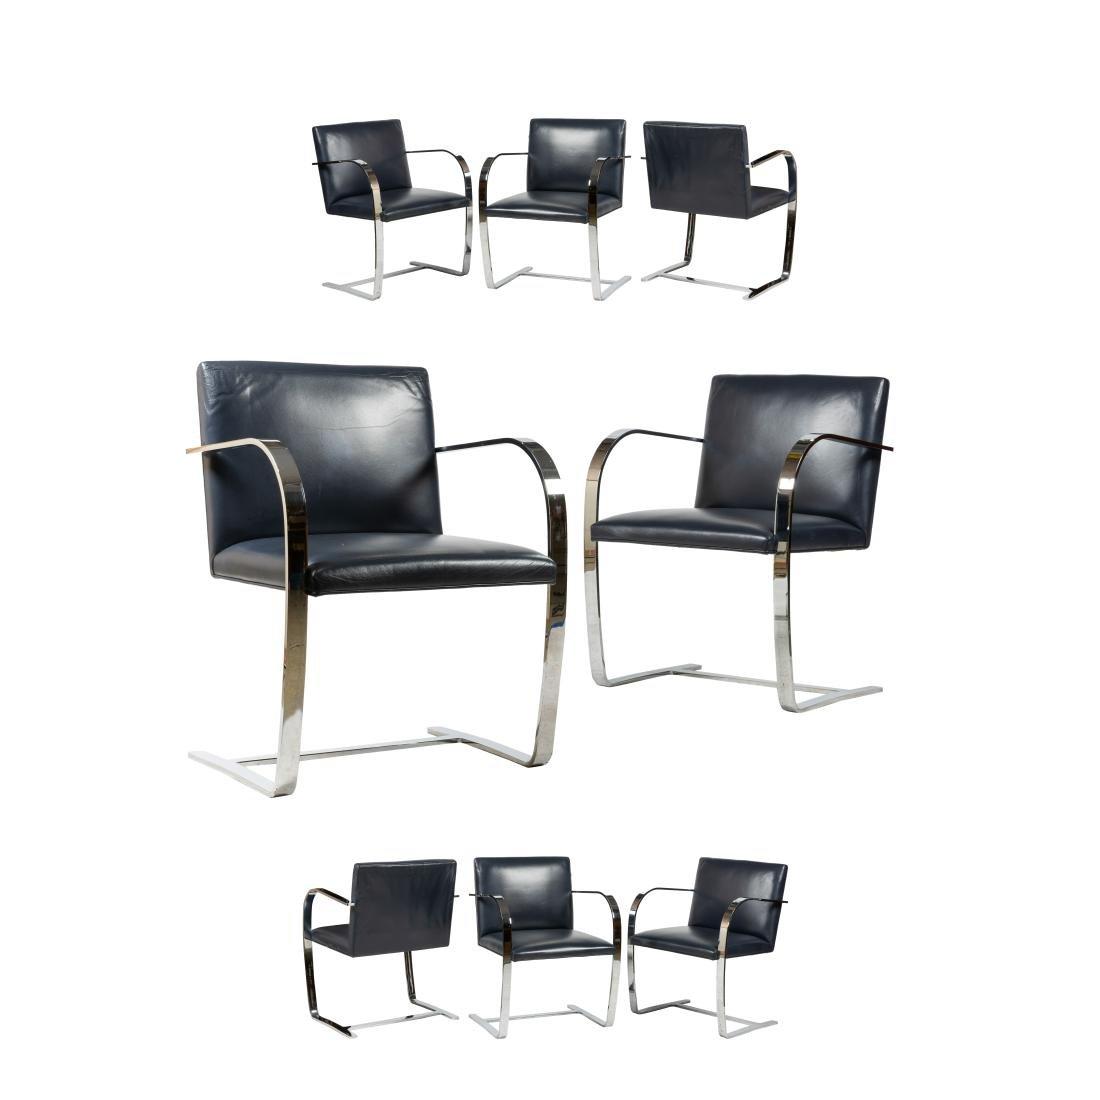 Mies Van Der Rohe - BRNO Chairs - Eight